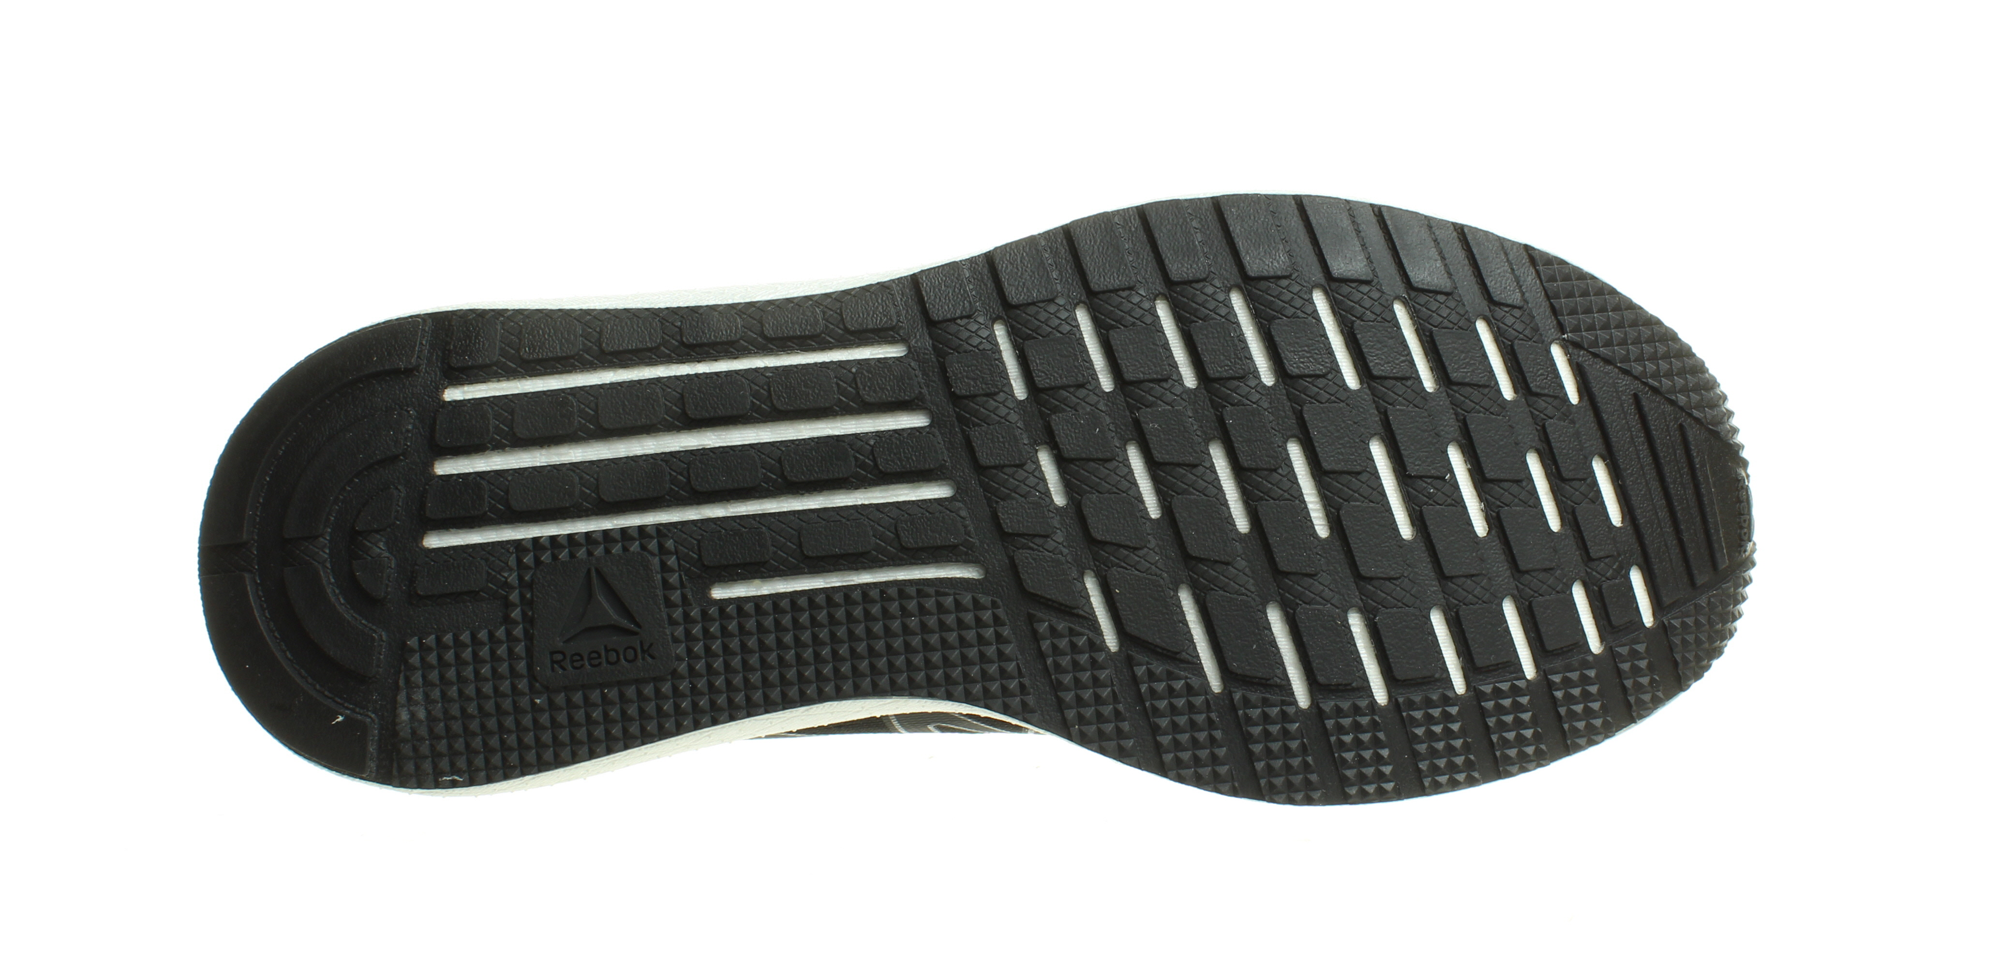 Reebok-Womens-Forever-Floatride-Energy-Running-Shoes thumbnail 13